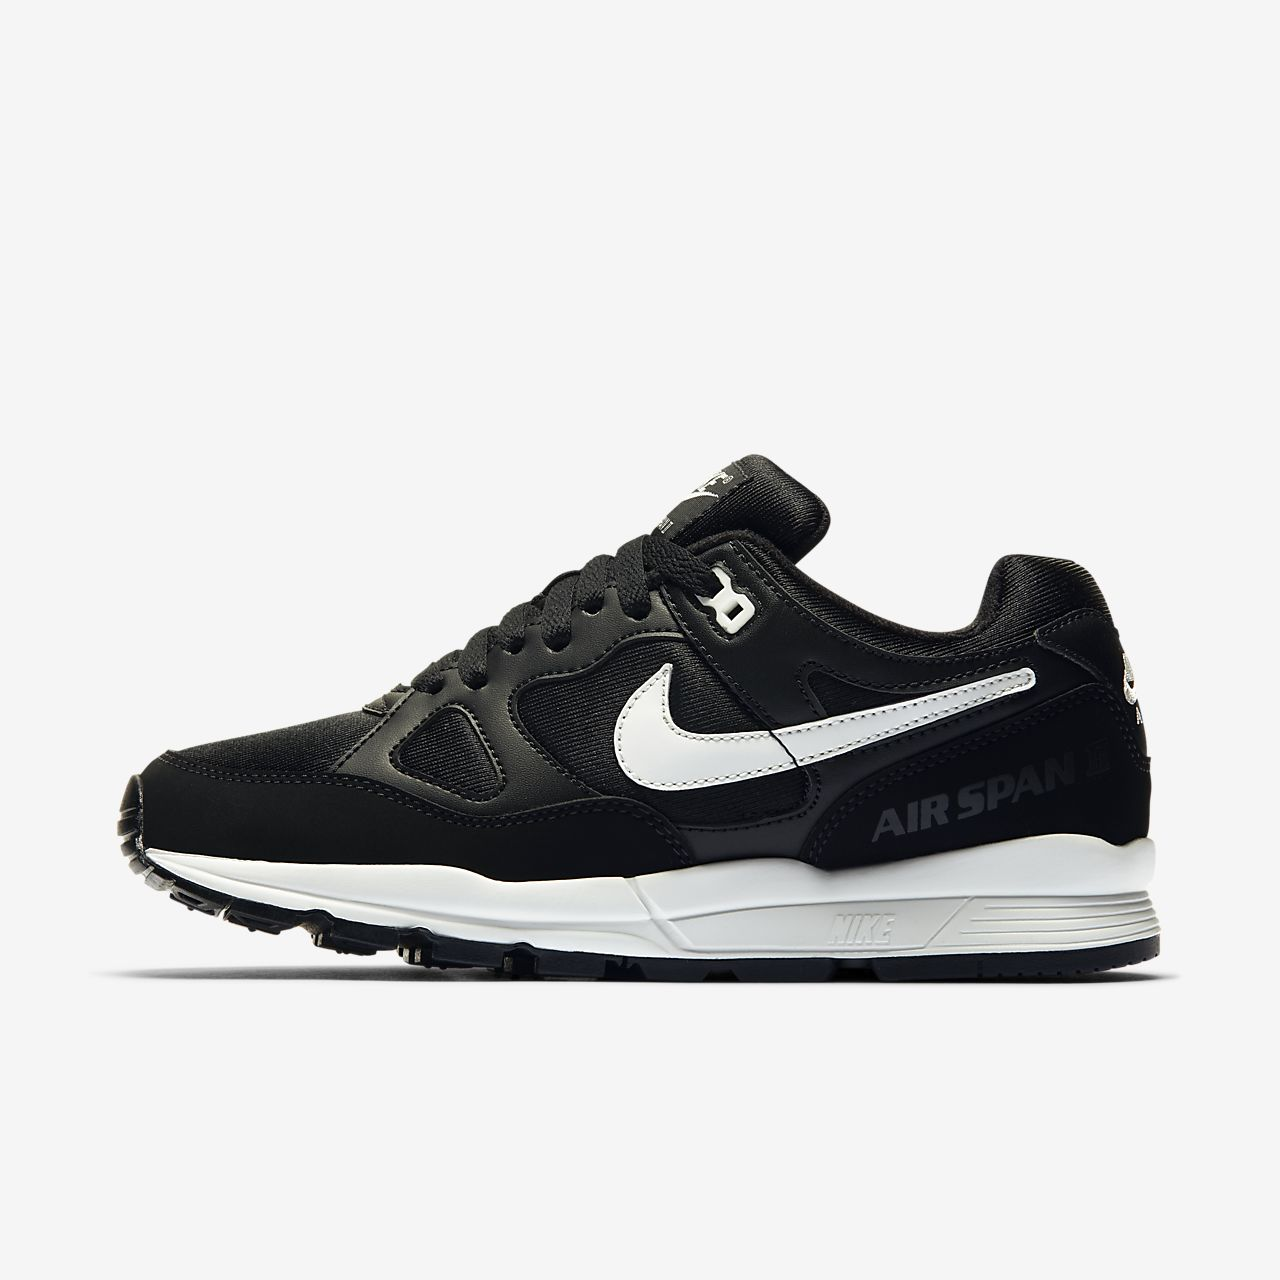 Nike Air Span II Damesschoen